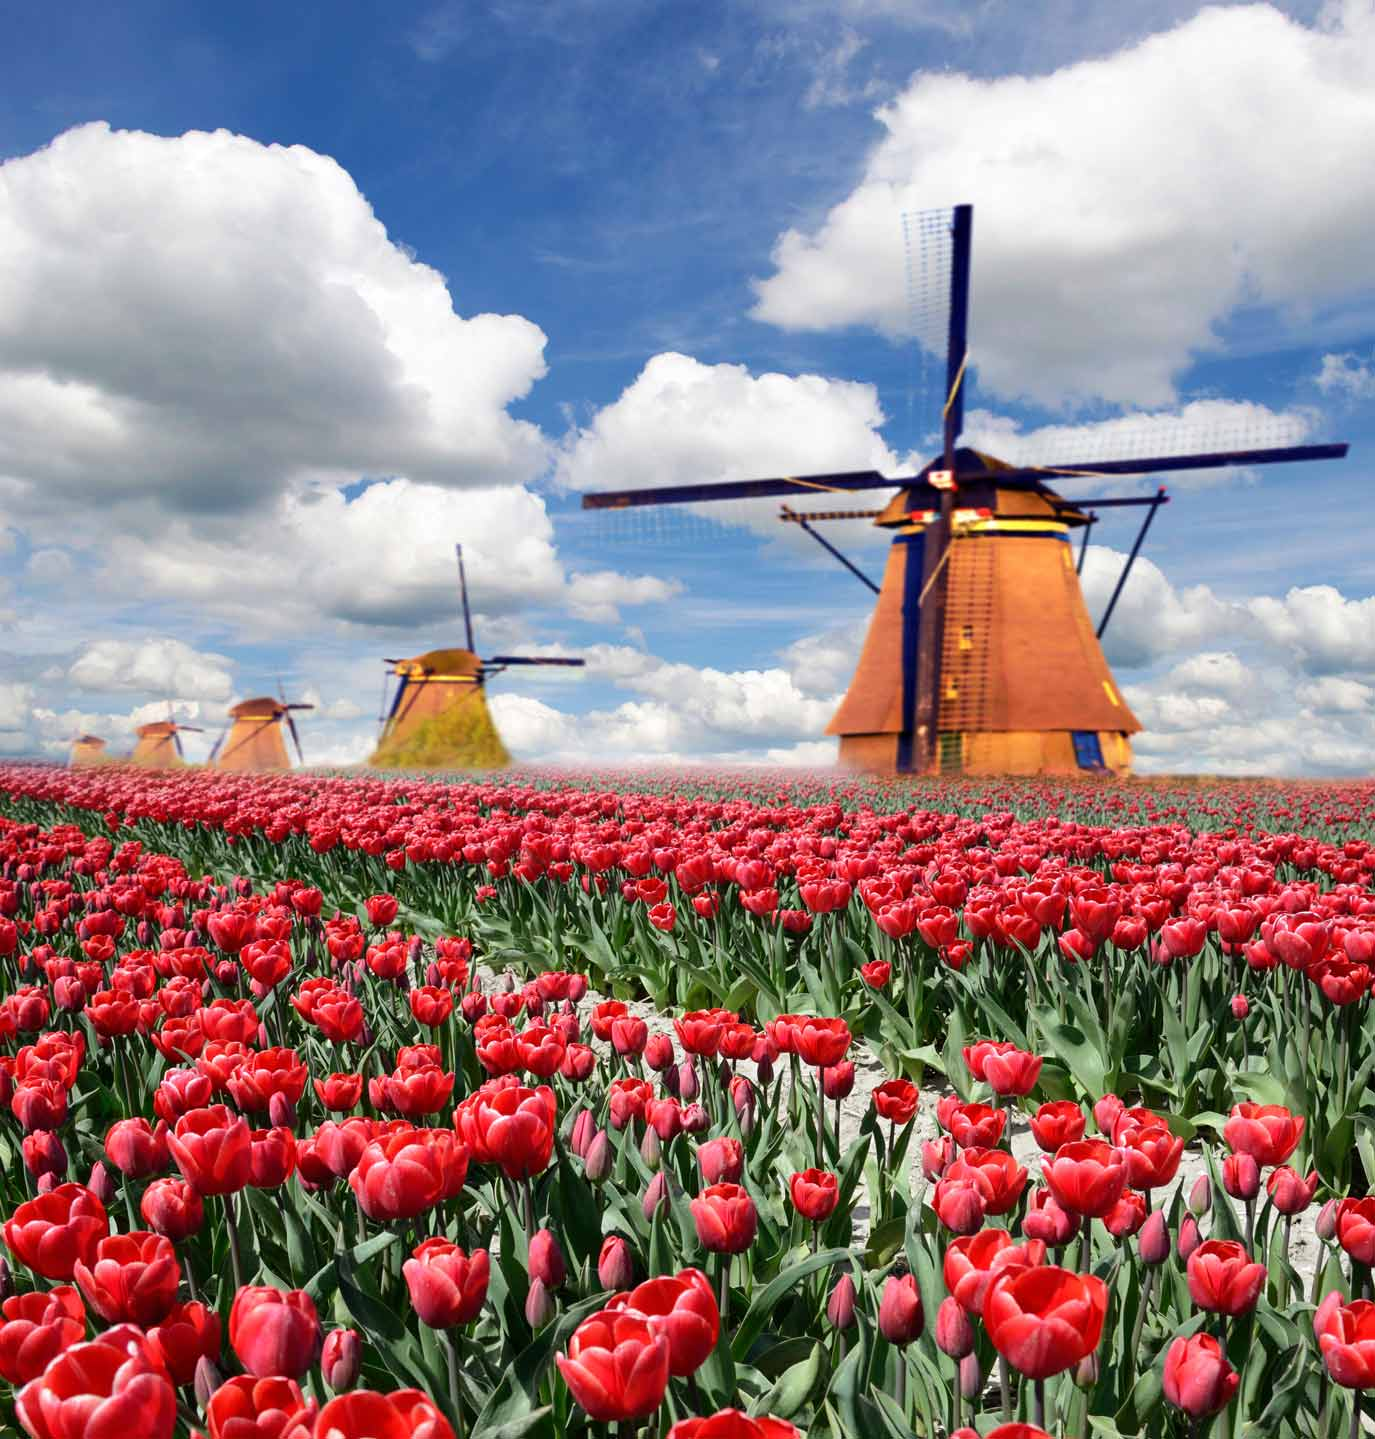 Tulpenblte Holland mit Blumencorso  Edtbrustner Reisen